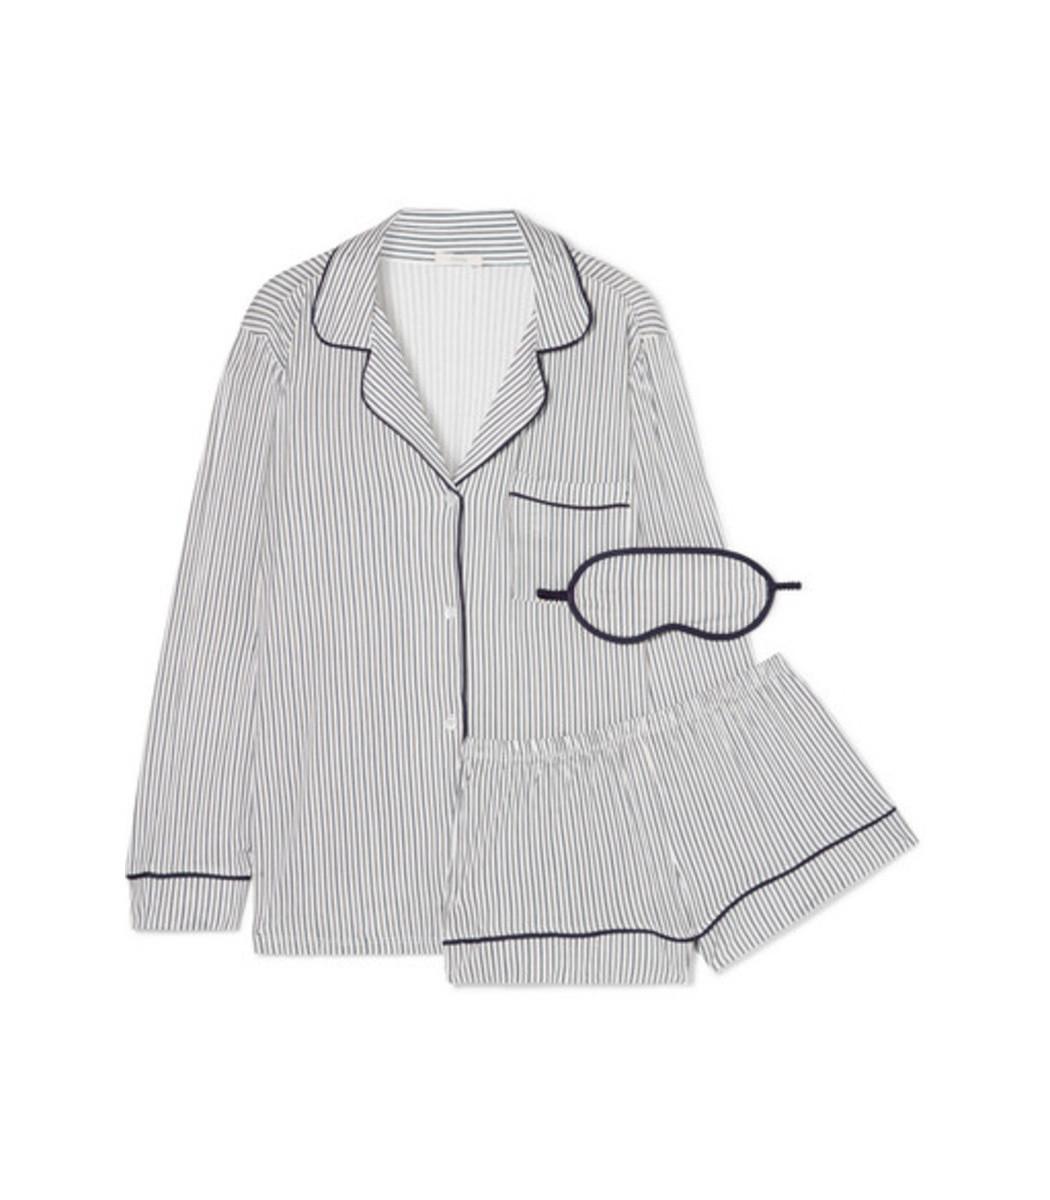 3cf2270183 Eberjey Sleep Chic Striped Jersey Pajama Set - ShopBAZAAR